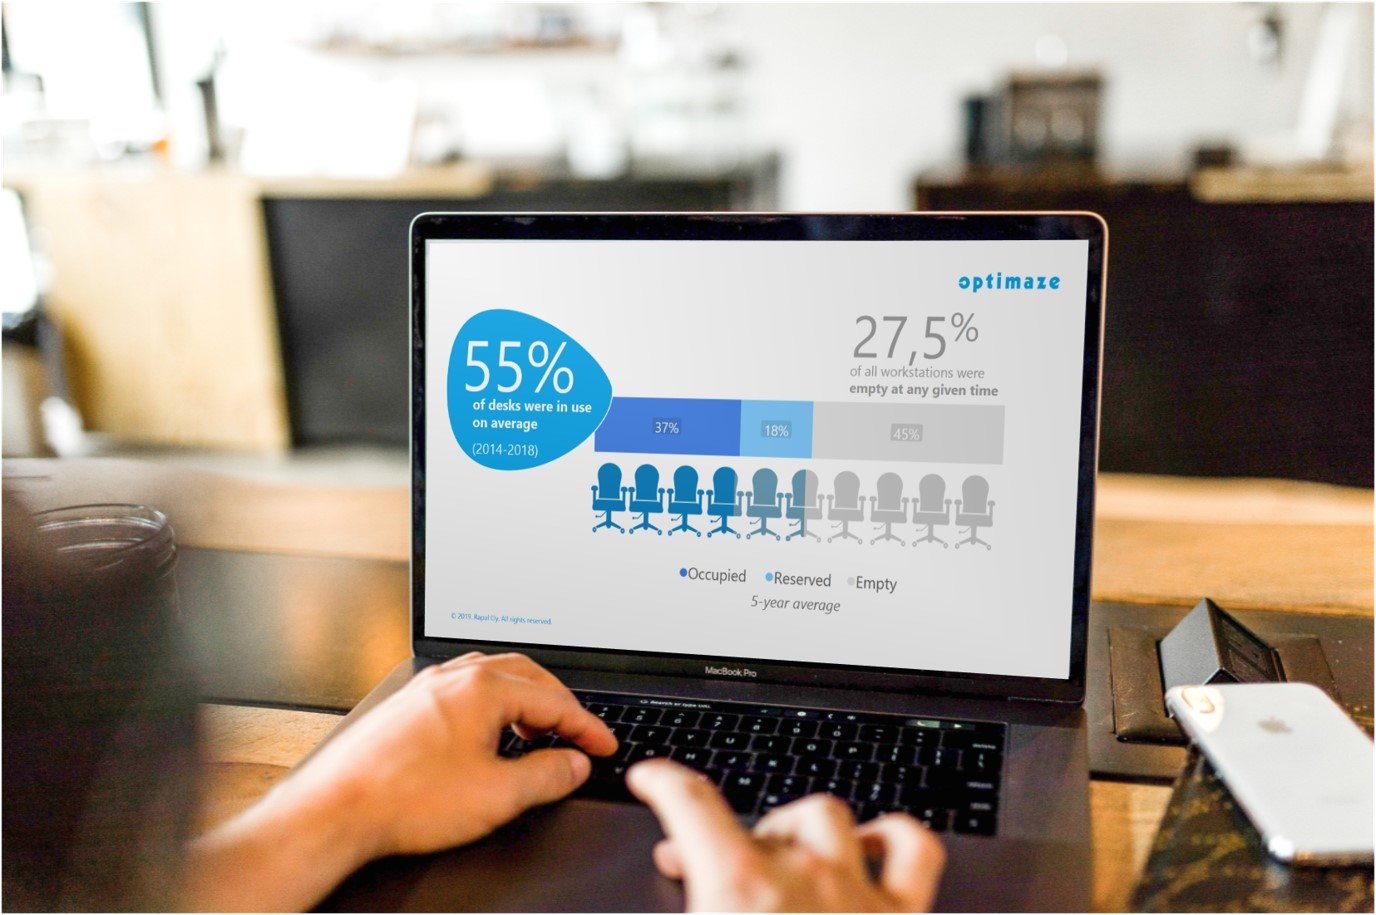 Optimaze Workplace Review innehåller benchmarking data.